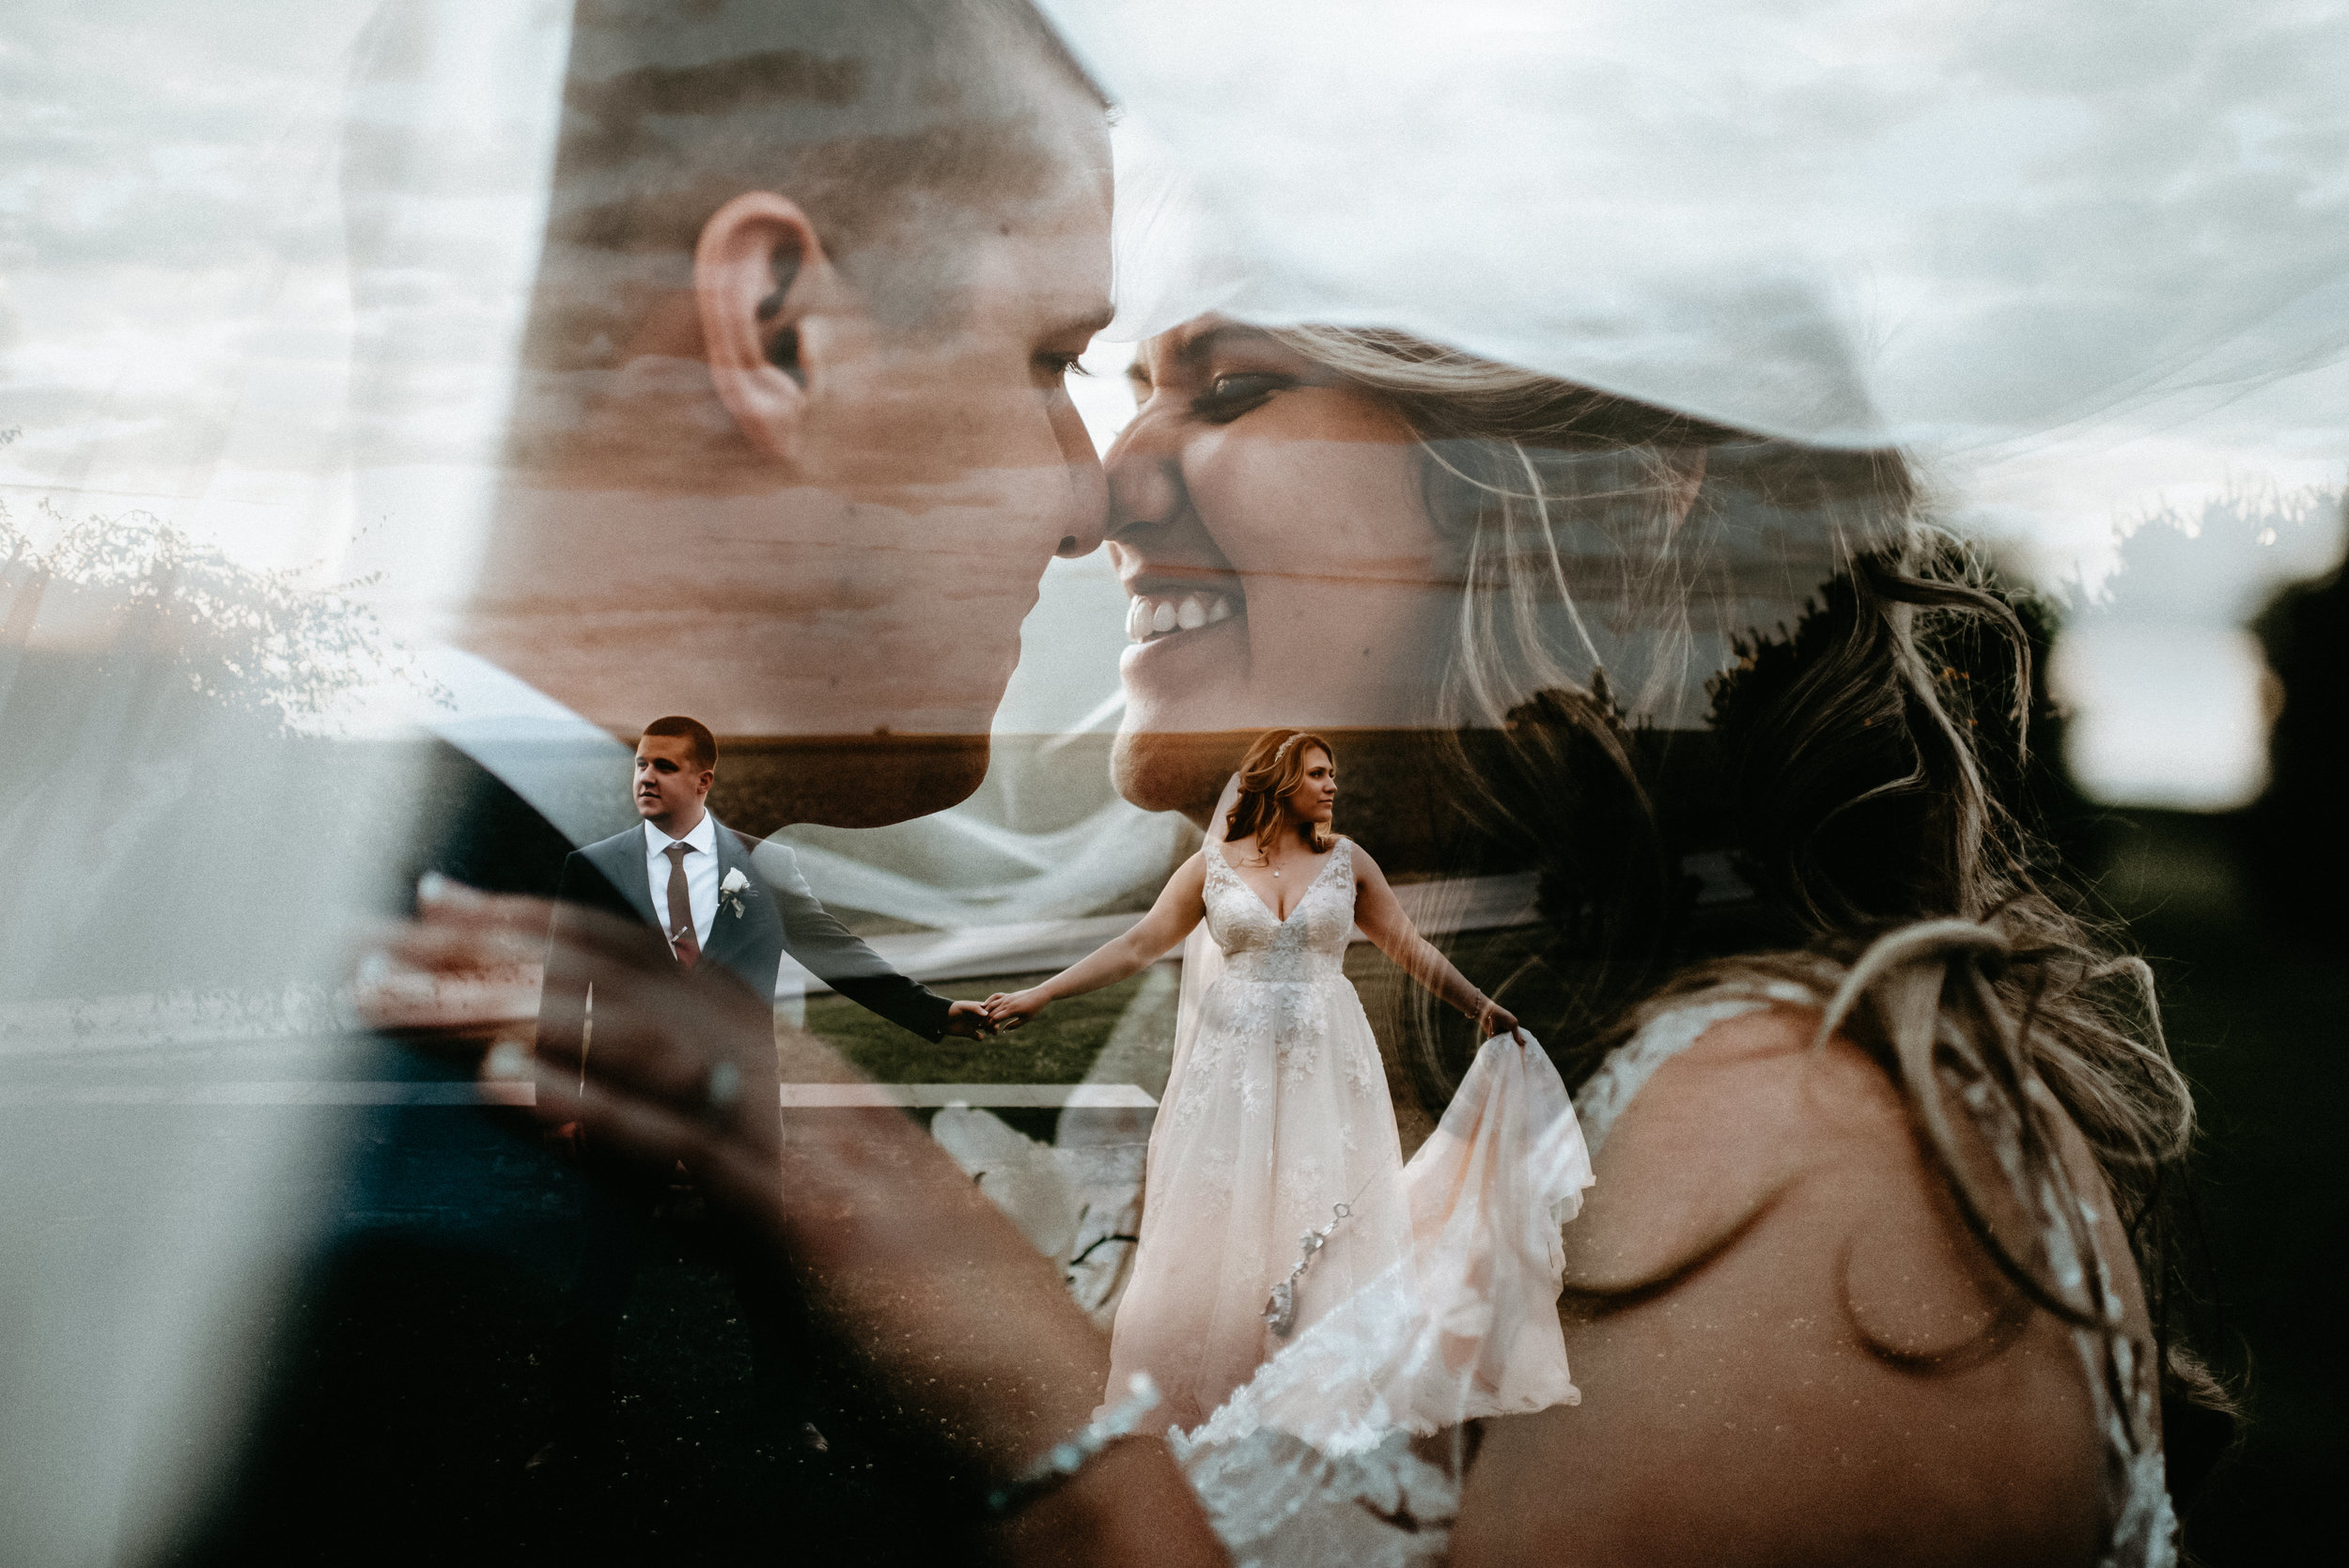 Mr. & Mrs. Samuels - Wedding at The Barn at Greystone Farm, Watsontown PA